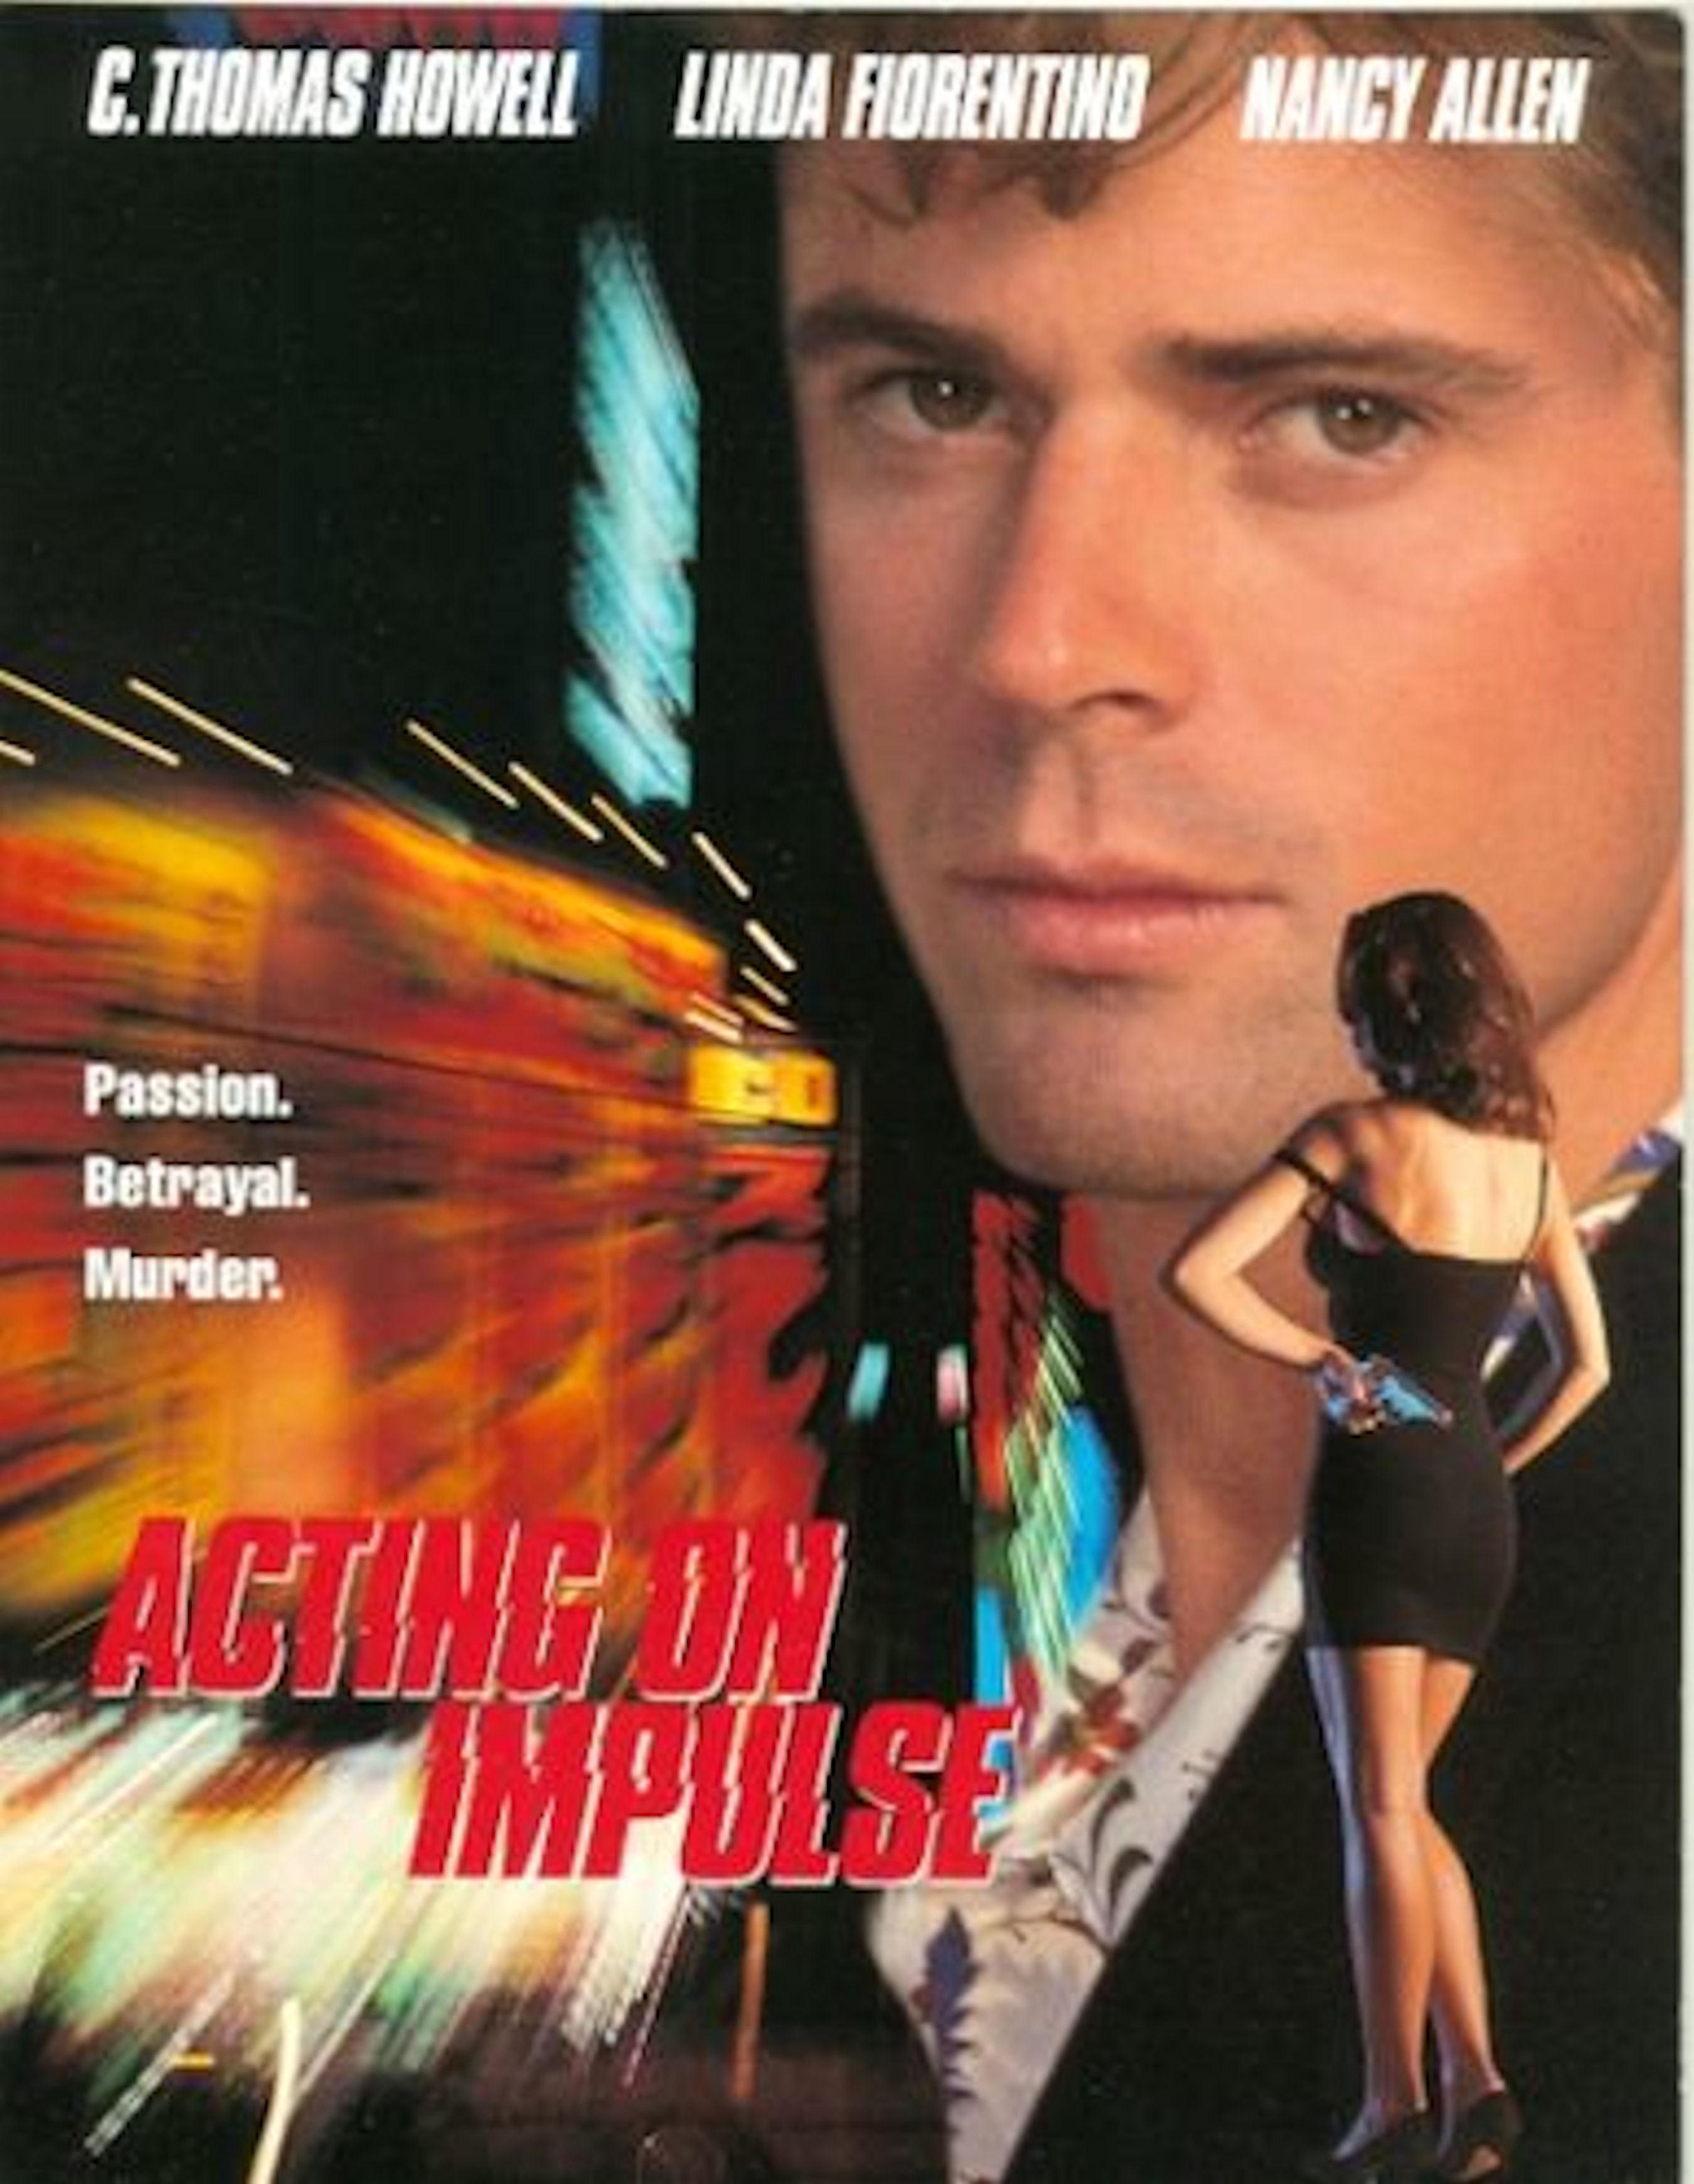 Acting on Impulse kapak